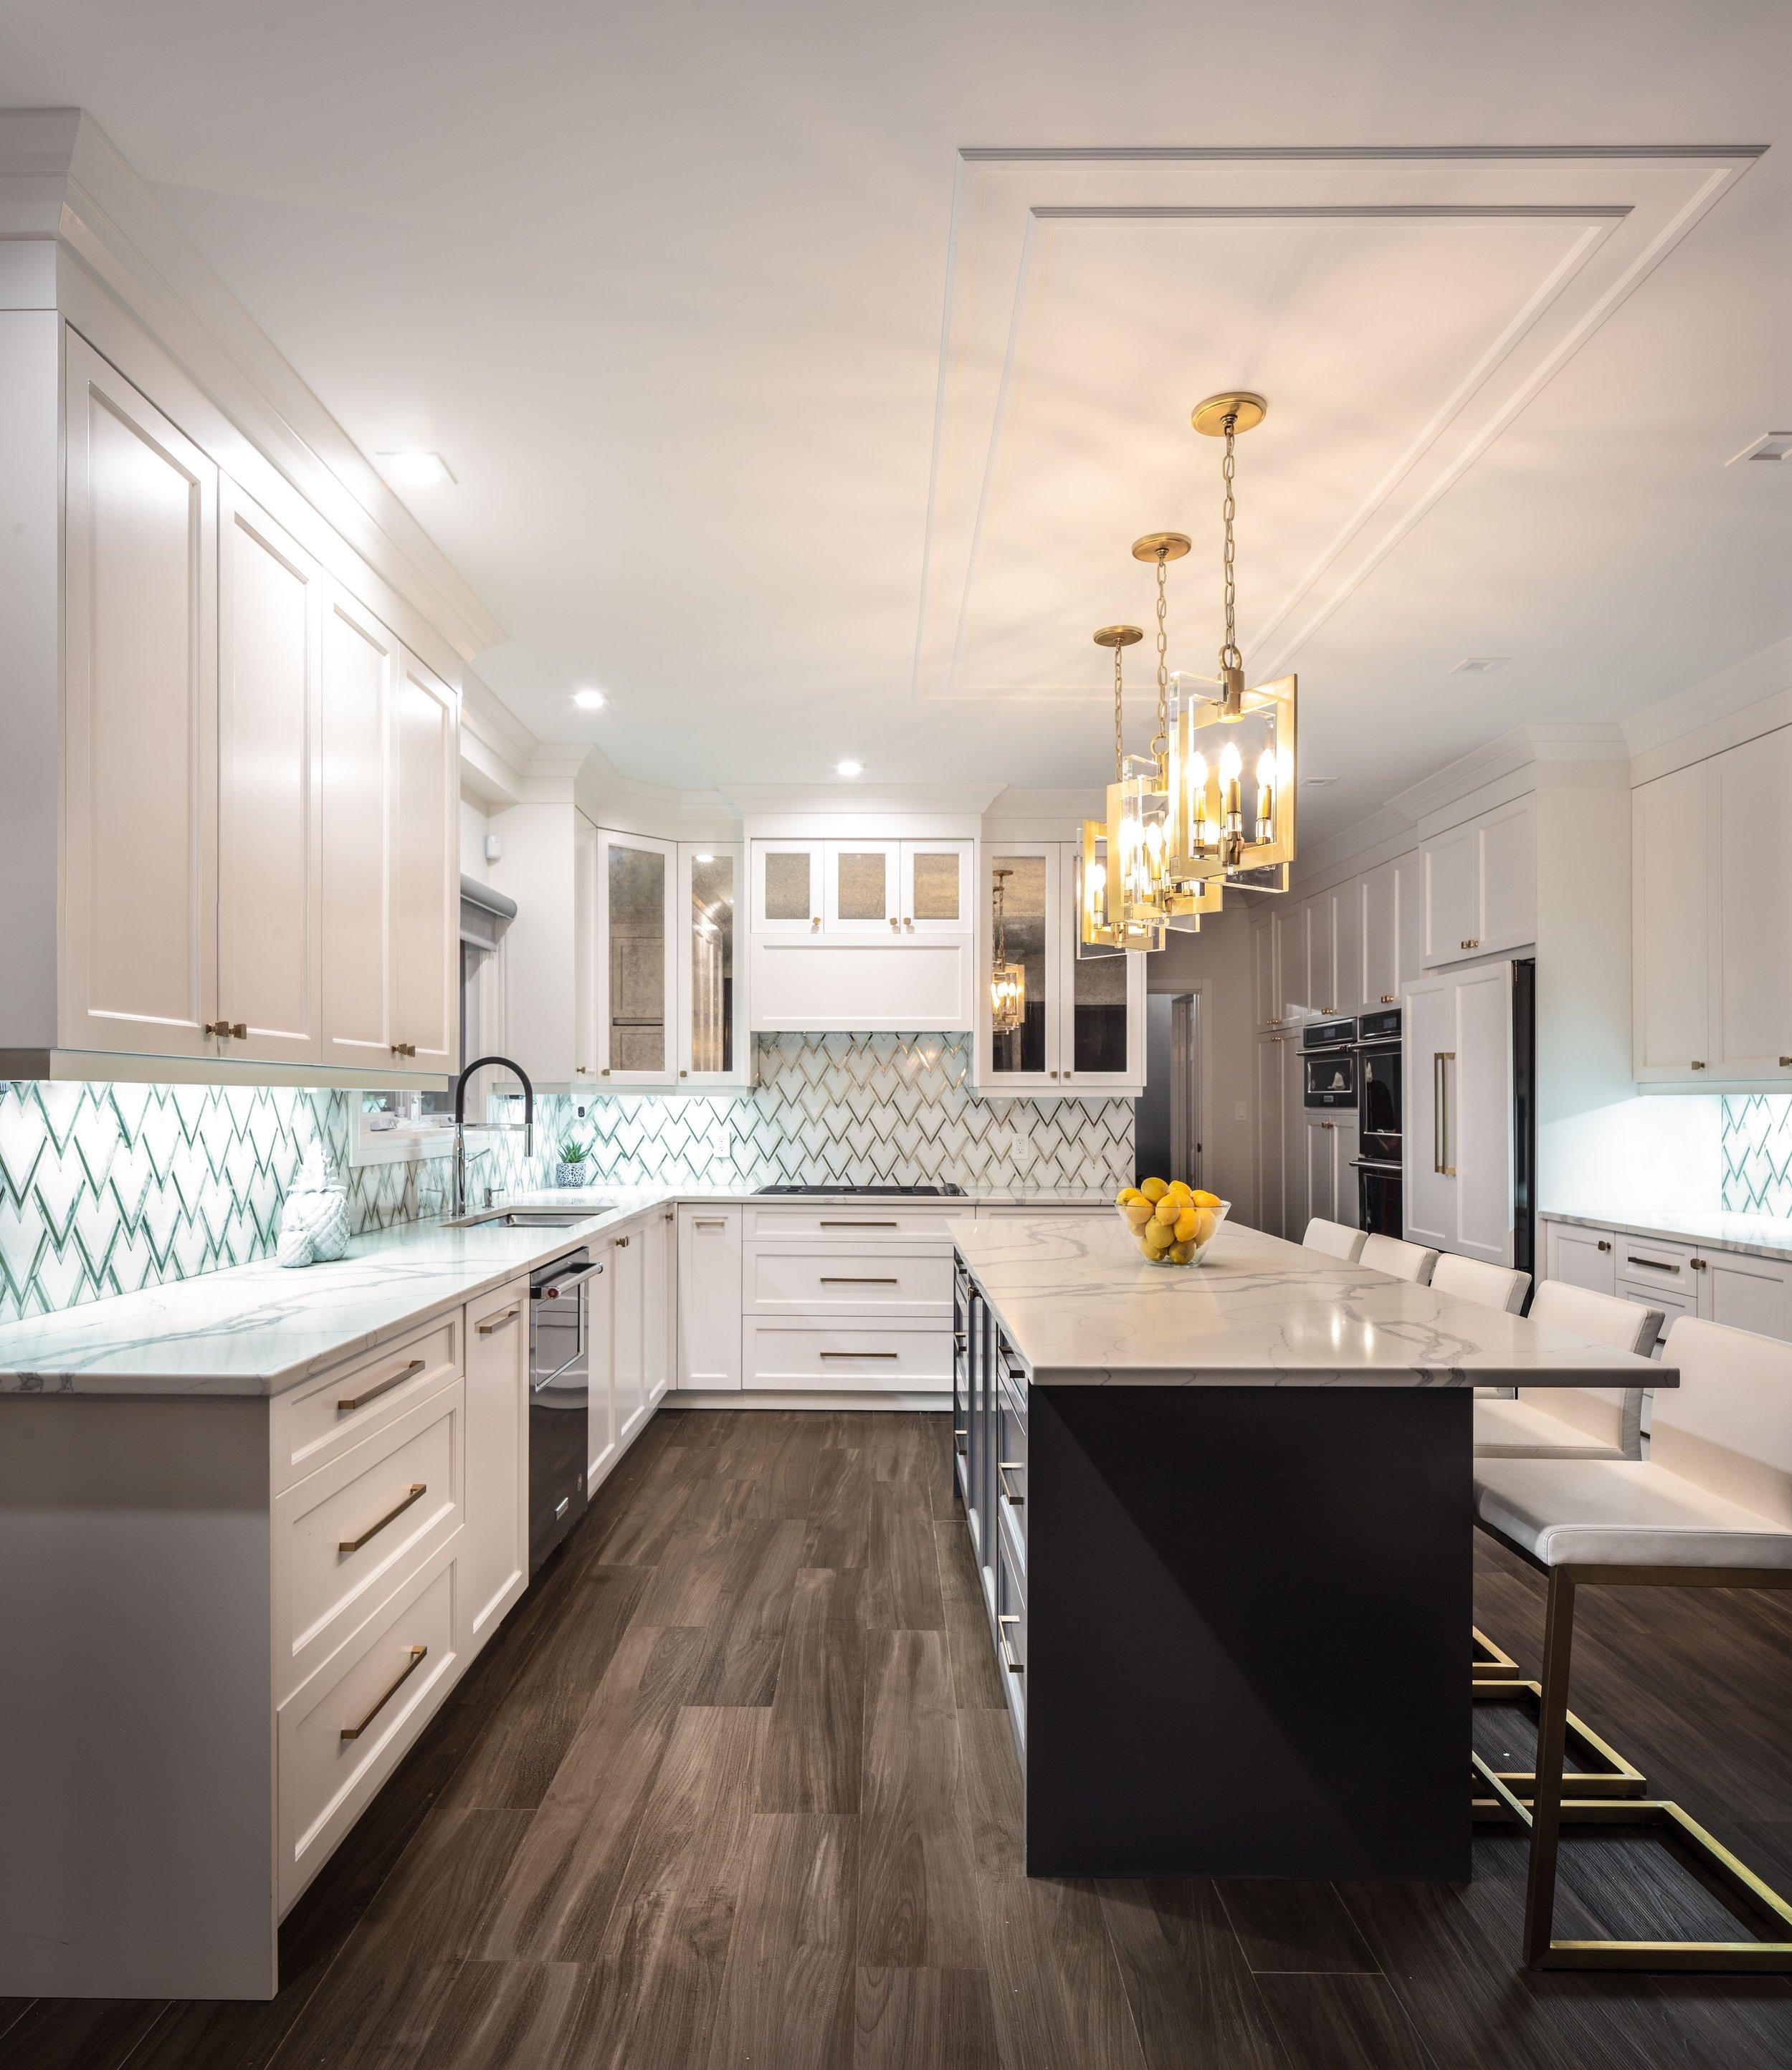 Interiors Photography - Kitchen